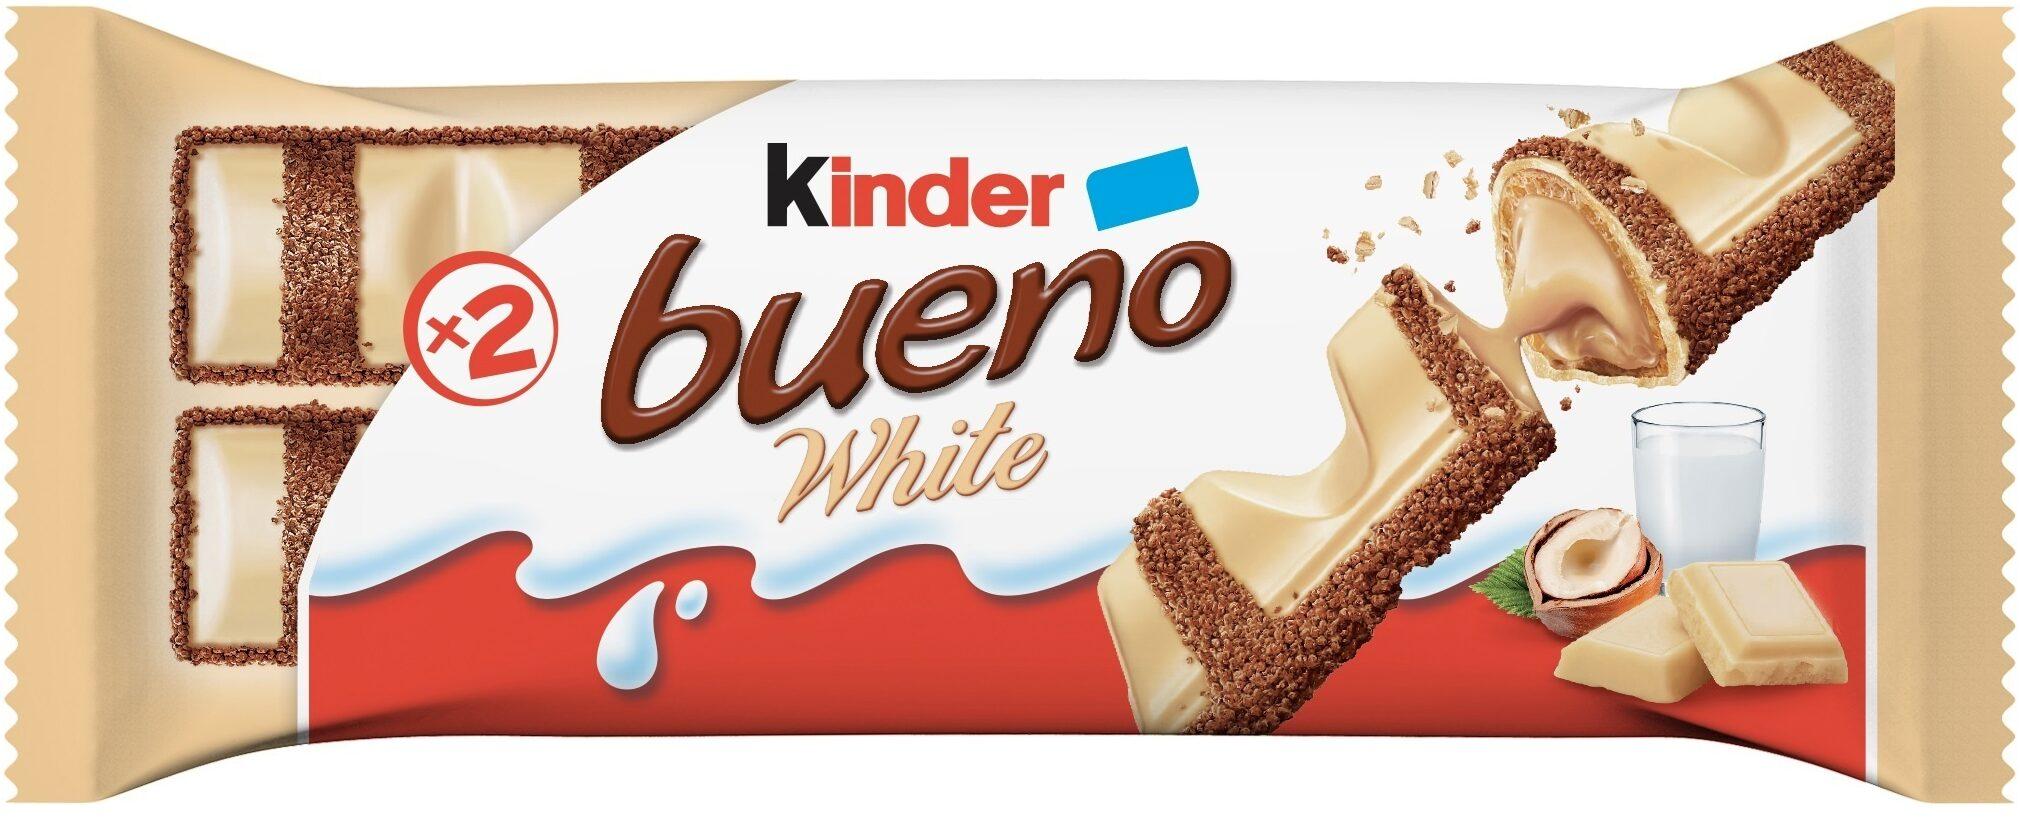 Kinder bueno white gaufrettes enrobees de chocolat blanc x2 barres - Product - fr